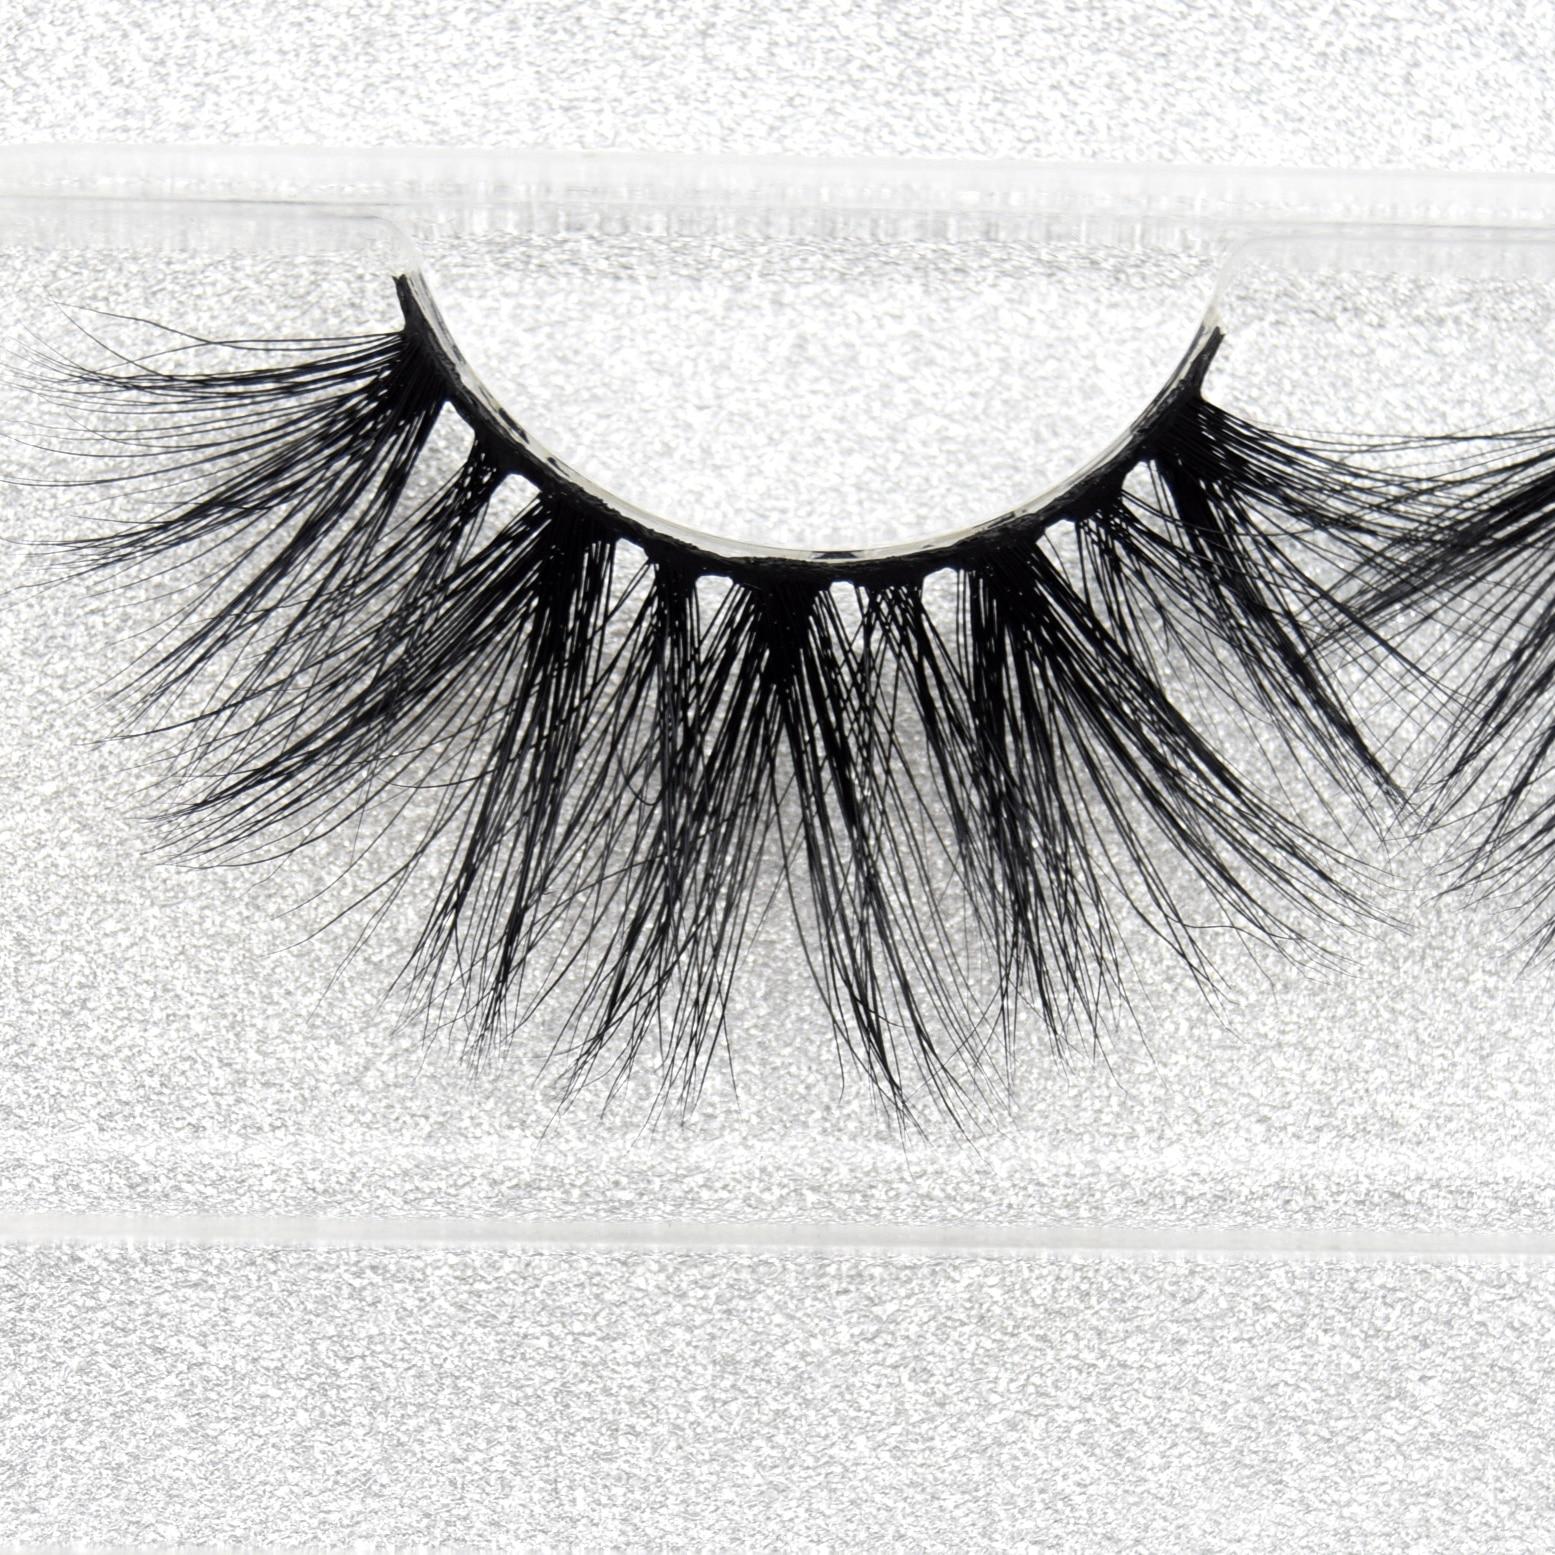 Visofree 25mm 100% Human Hair Eyelashes Clear Band Lashes Natural Look Glamorous Effect Handmade Lashes Makeup   E62